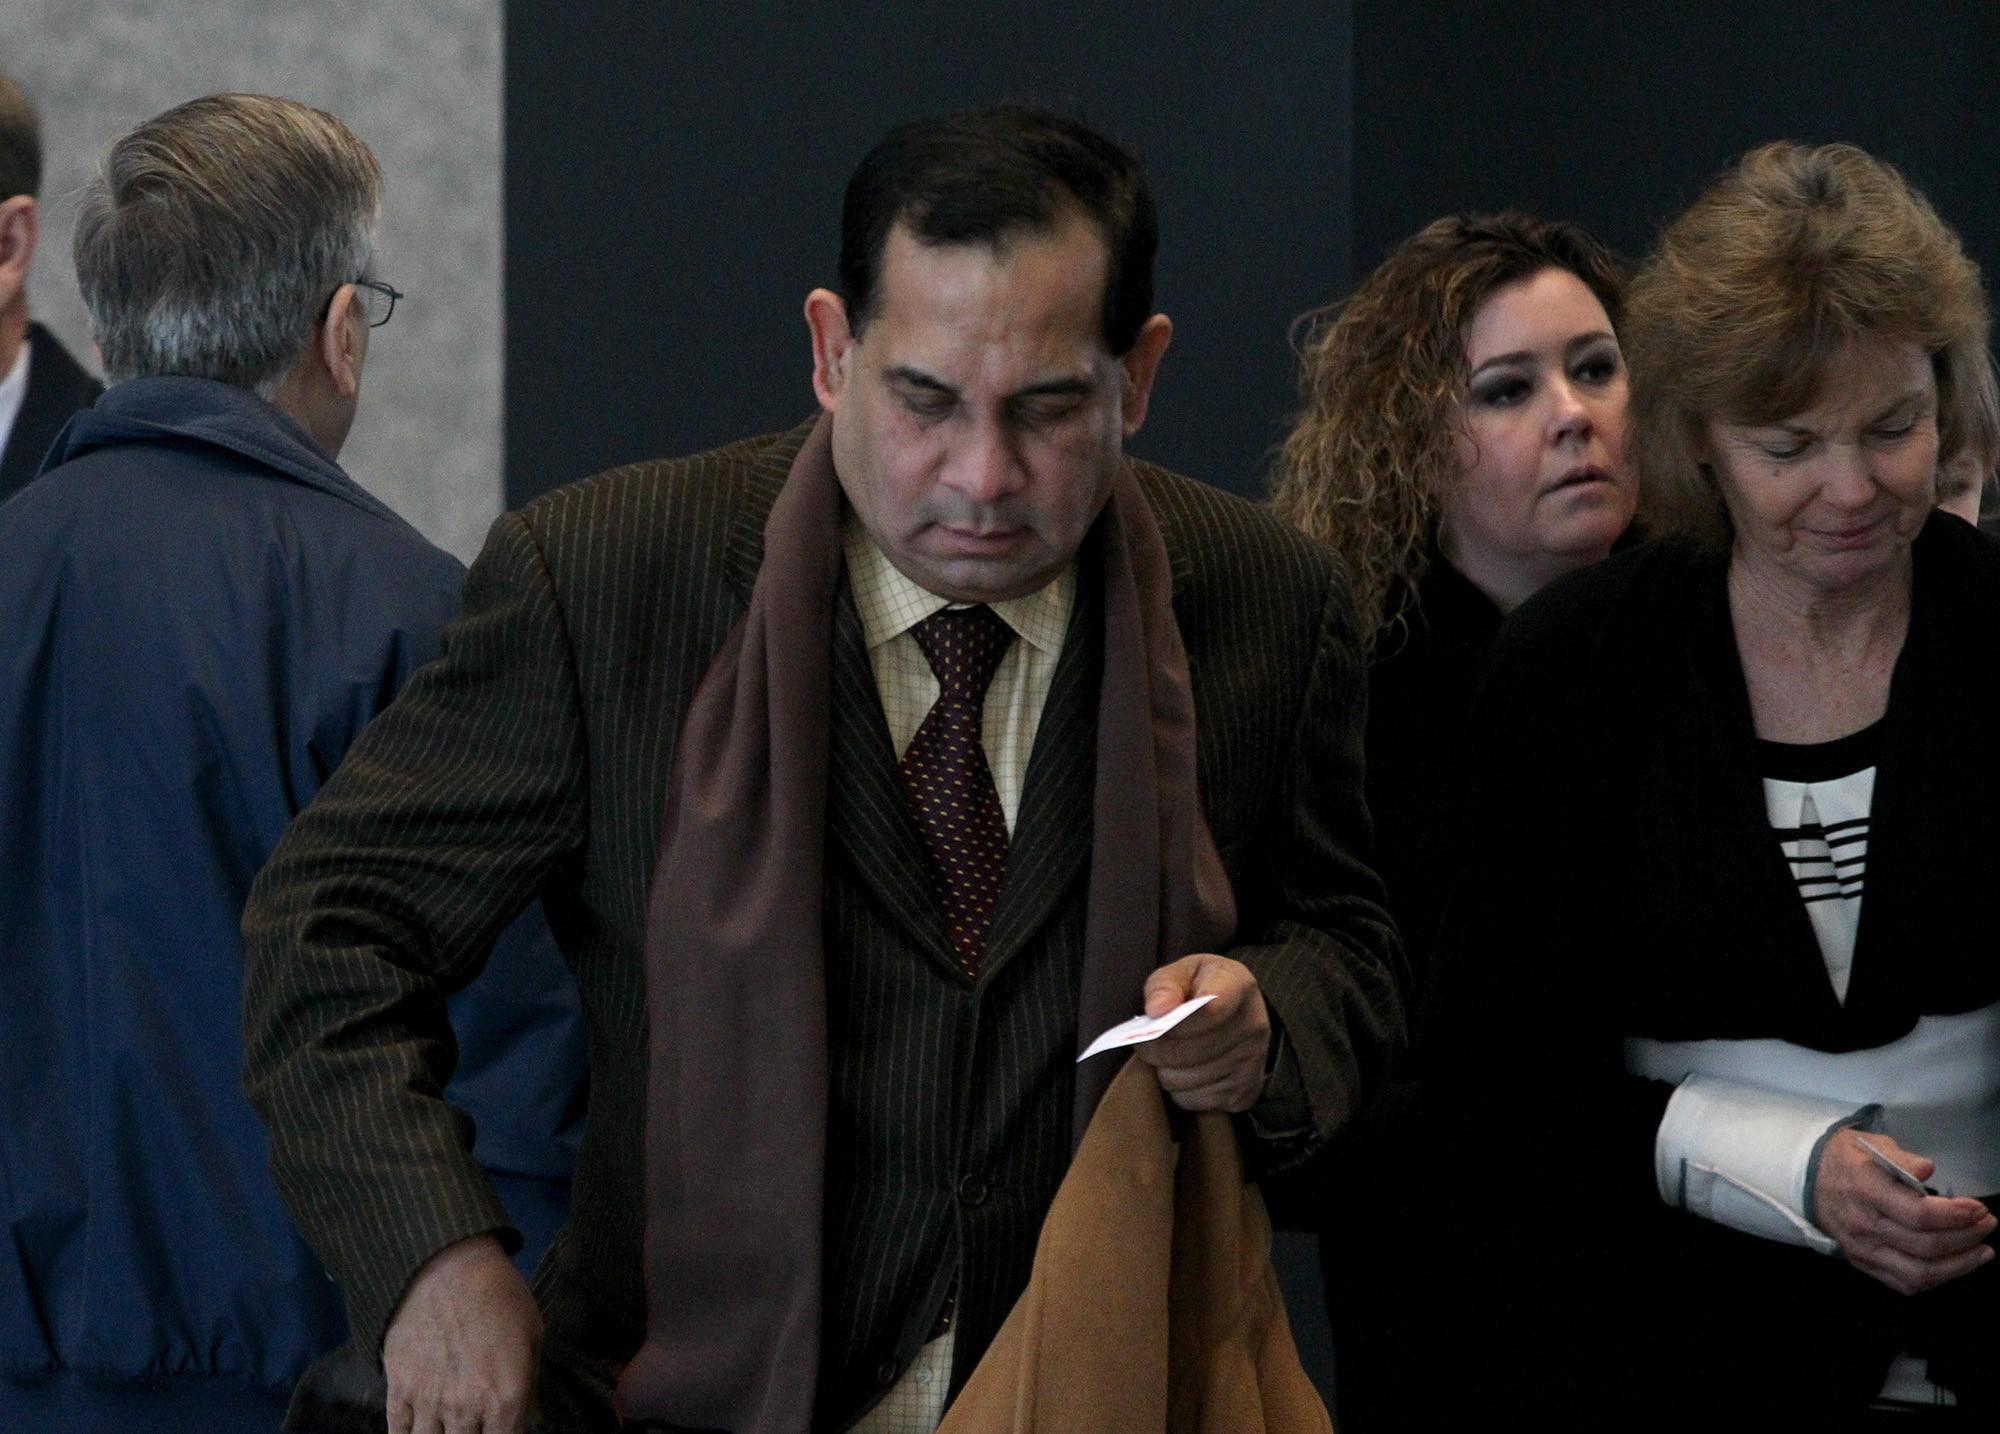 Raghuveer Nayak, former fundraiser for former congressman Jesse Jackson Jr. walks into the Dirksen U.S. Courthouse in Chicago on Monday for his sentencing hearing.